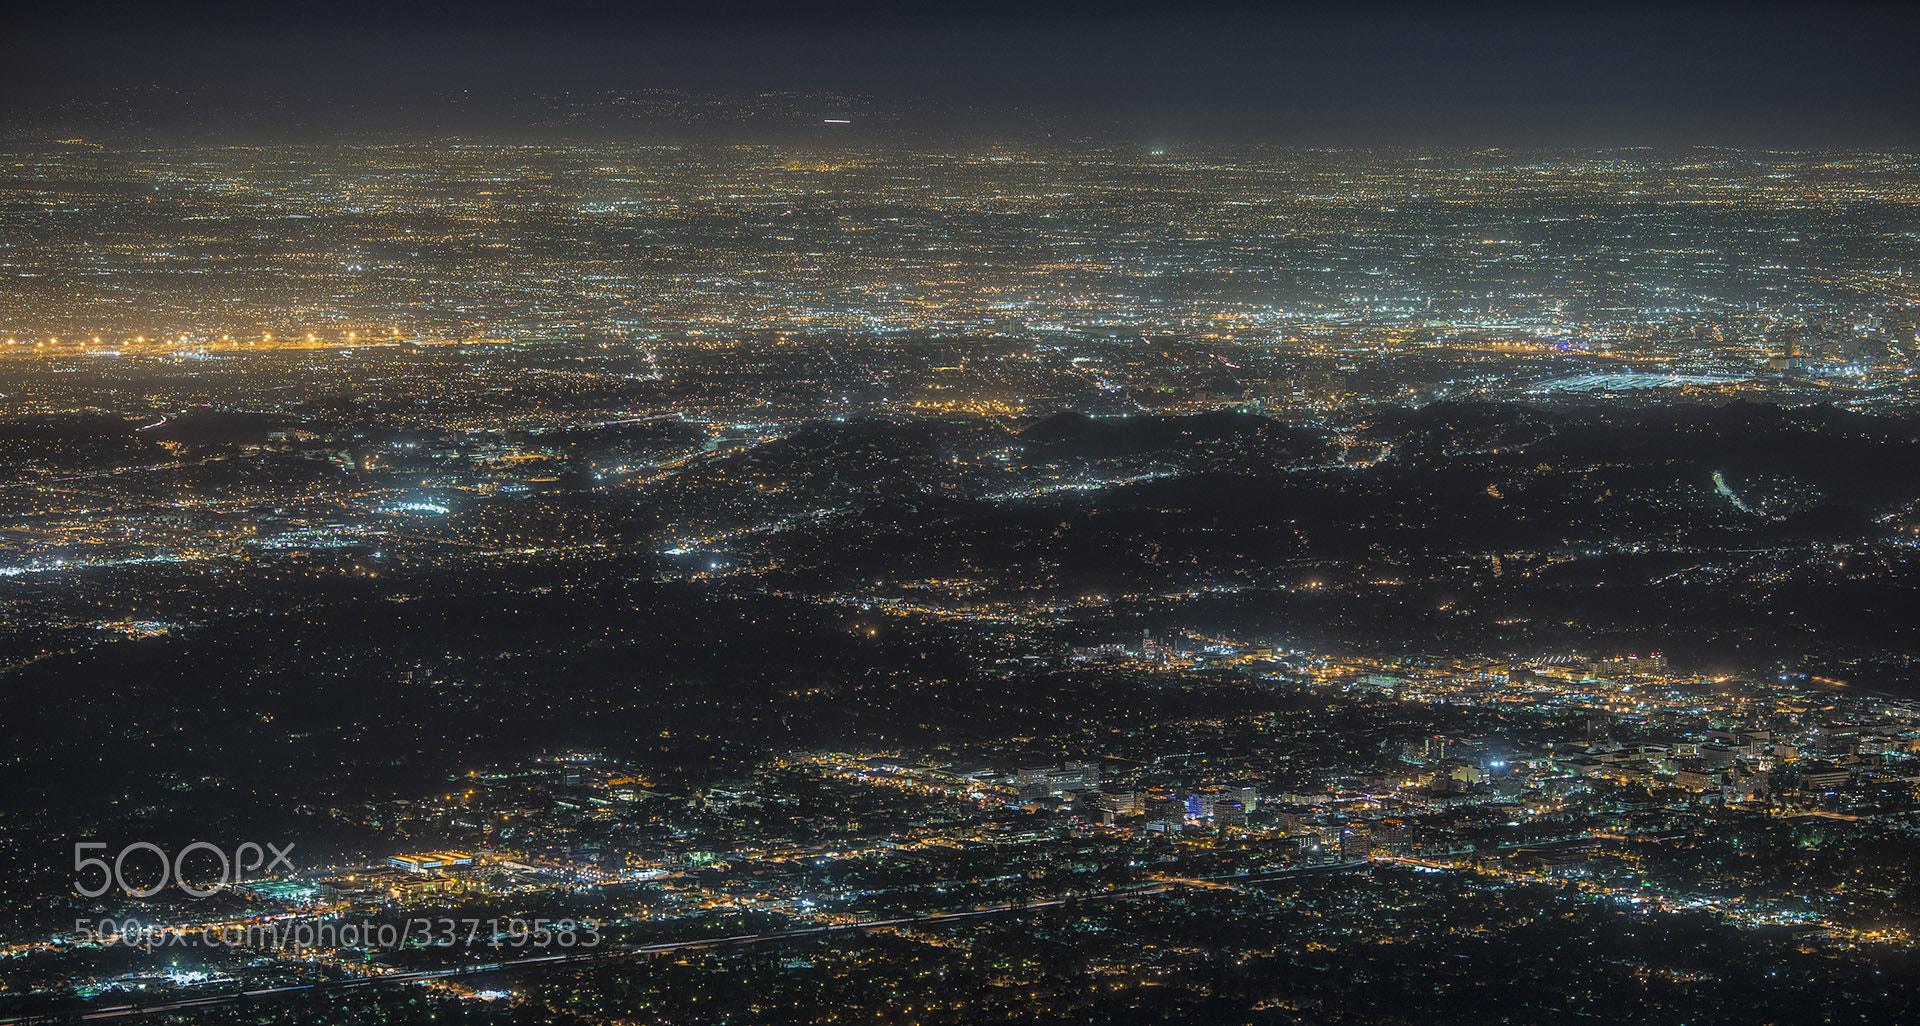 Photograph LA in night by daniel vojtech on 500px